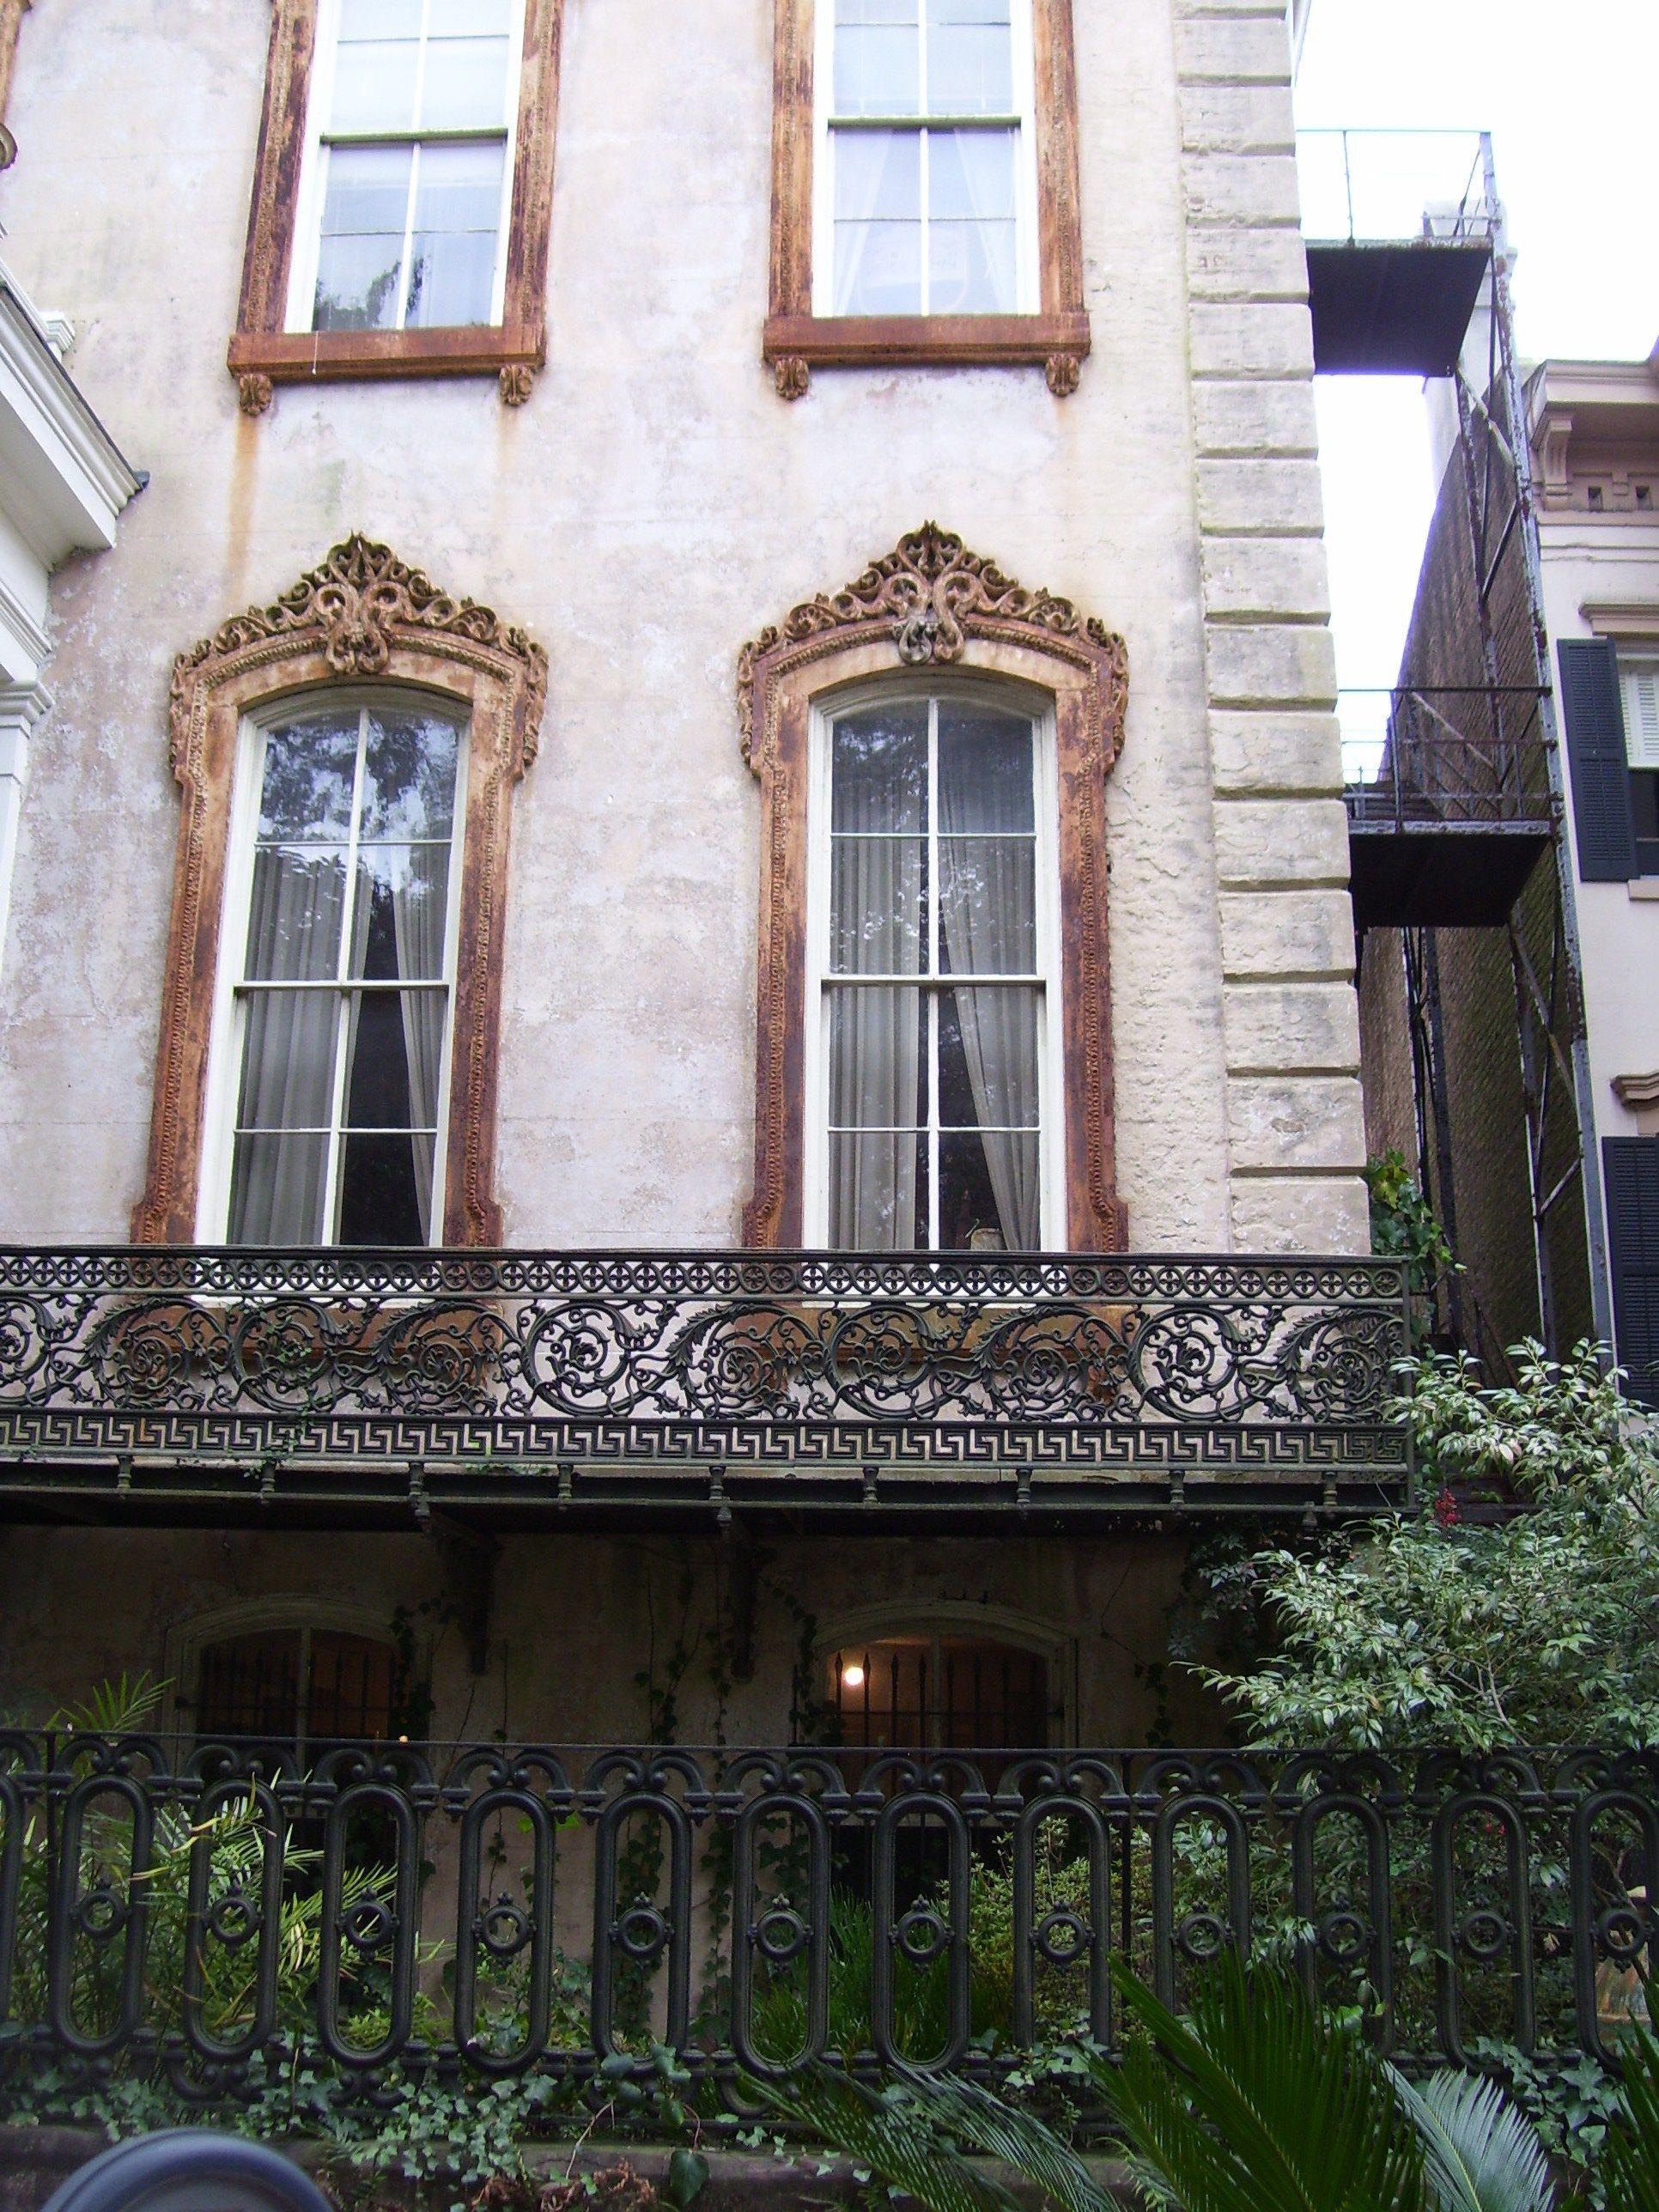 Balcony Fence Design: Cast Iron Balcony Railing & Fence, Savannah GA. Why Is